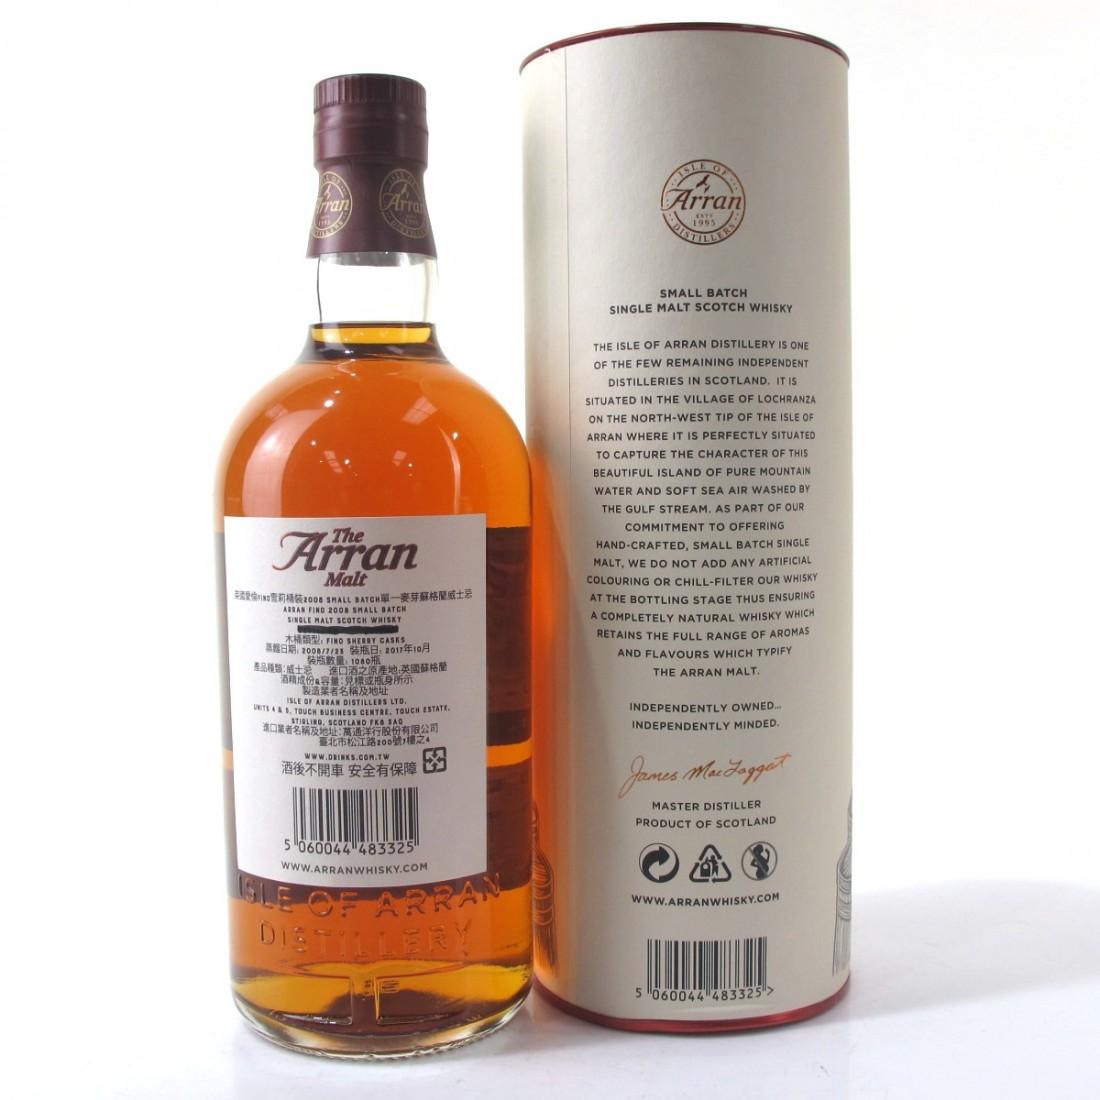 Arran 2008 Small Batch Fino Sherry Cask / Drinks 25th Anniversary